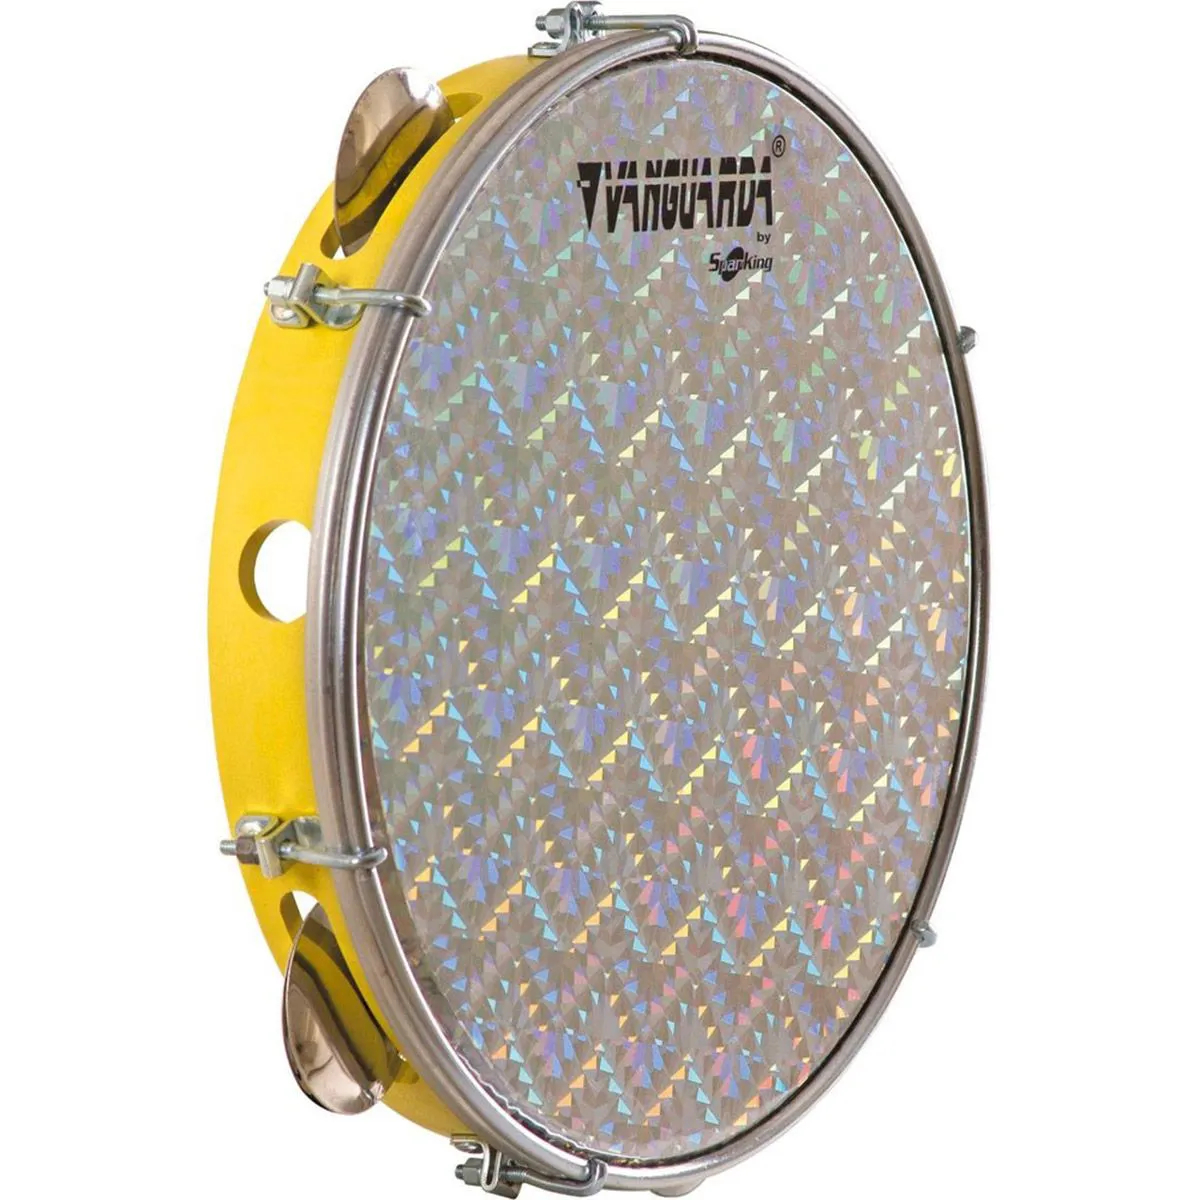 Pandeiro Spanking 10 Aro ABS Amarelo Pele Holográfica Prata